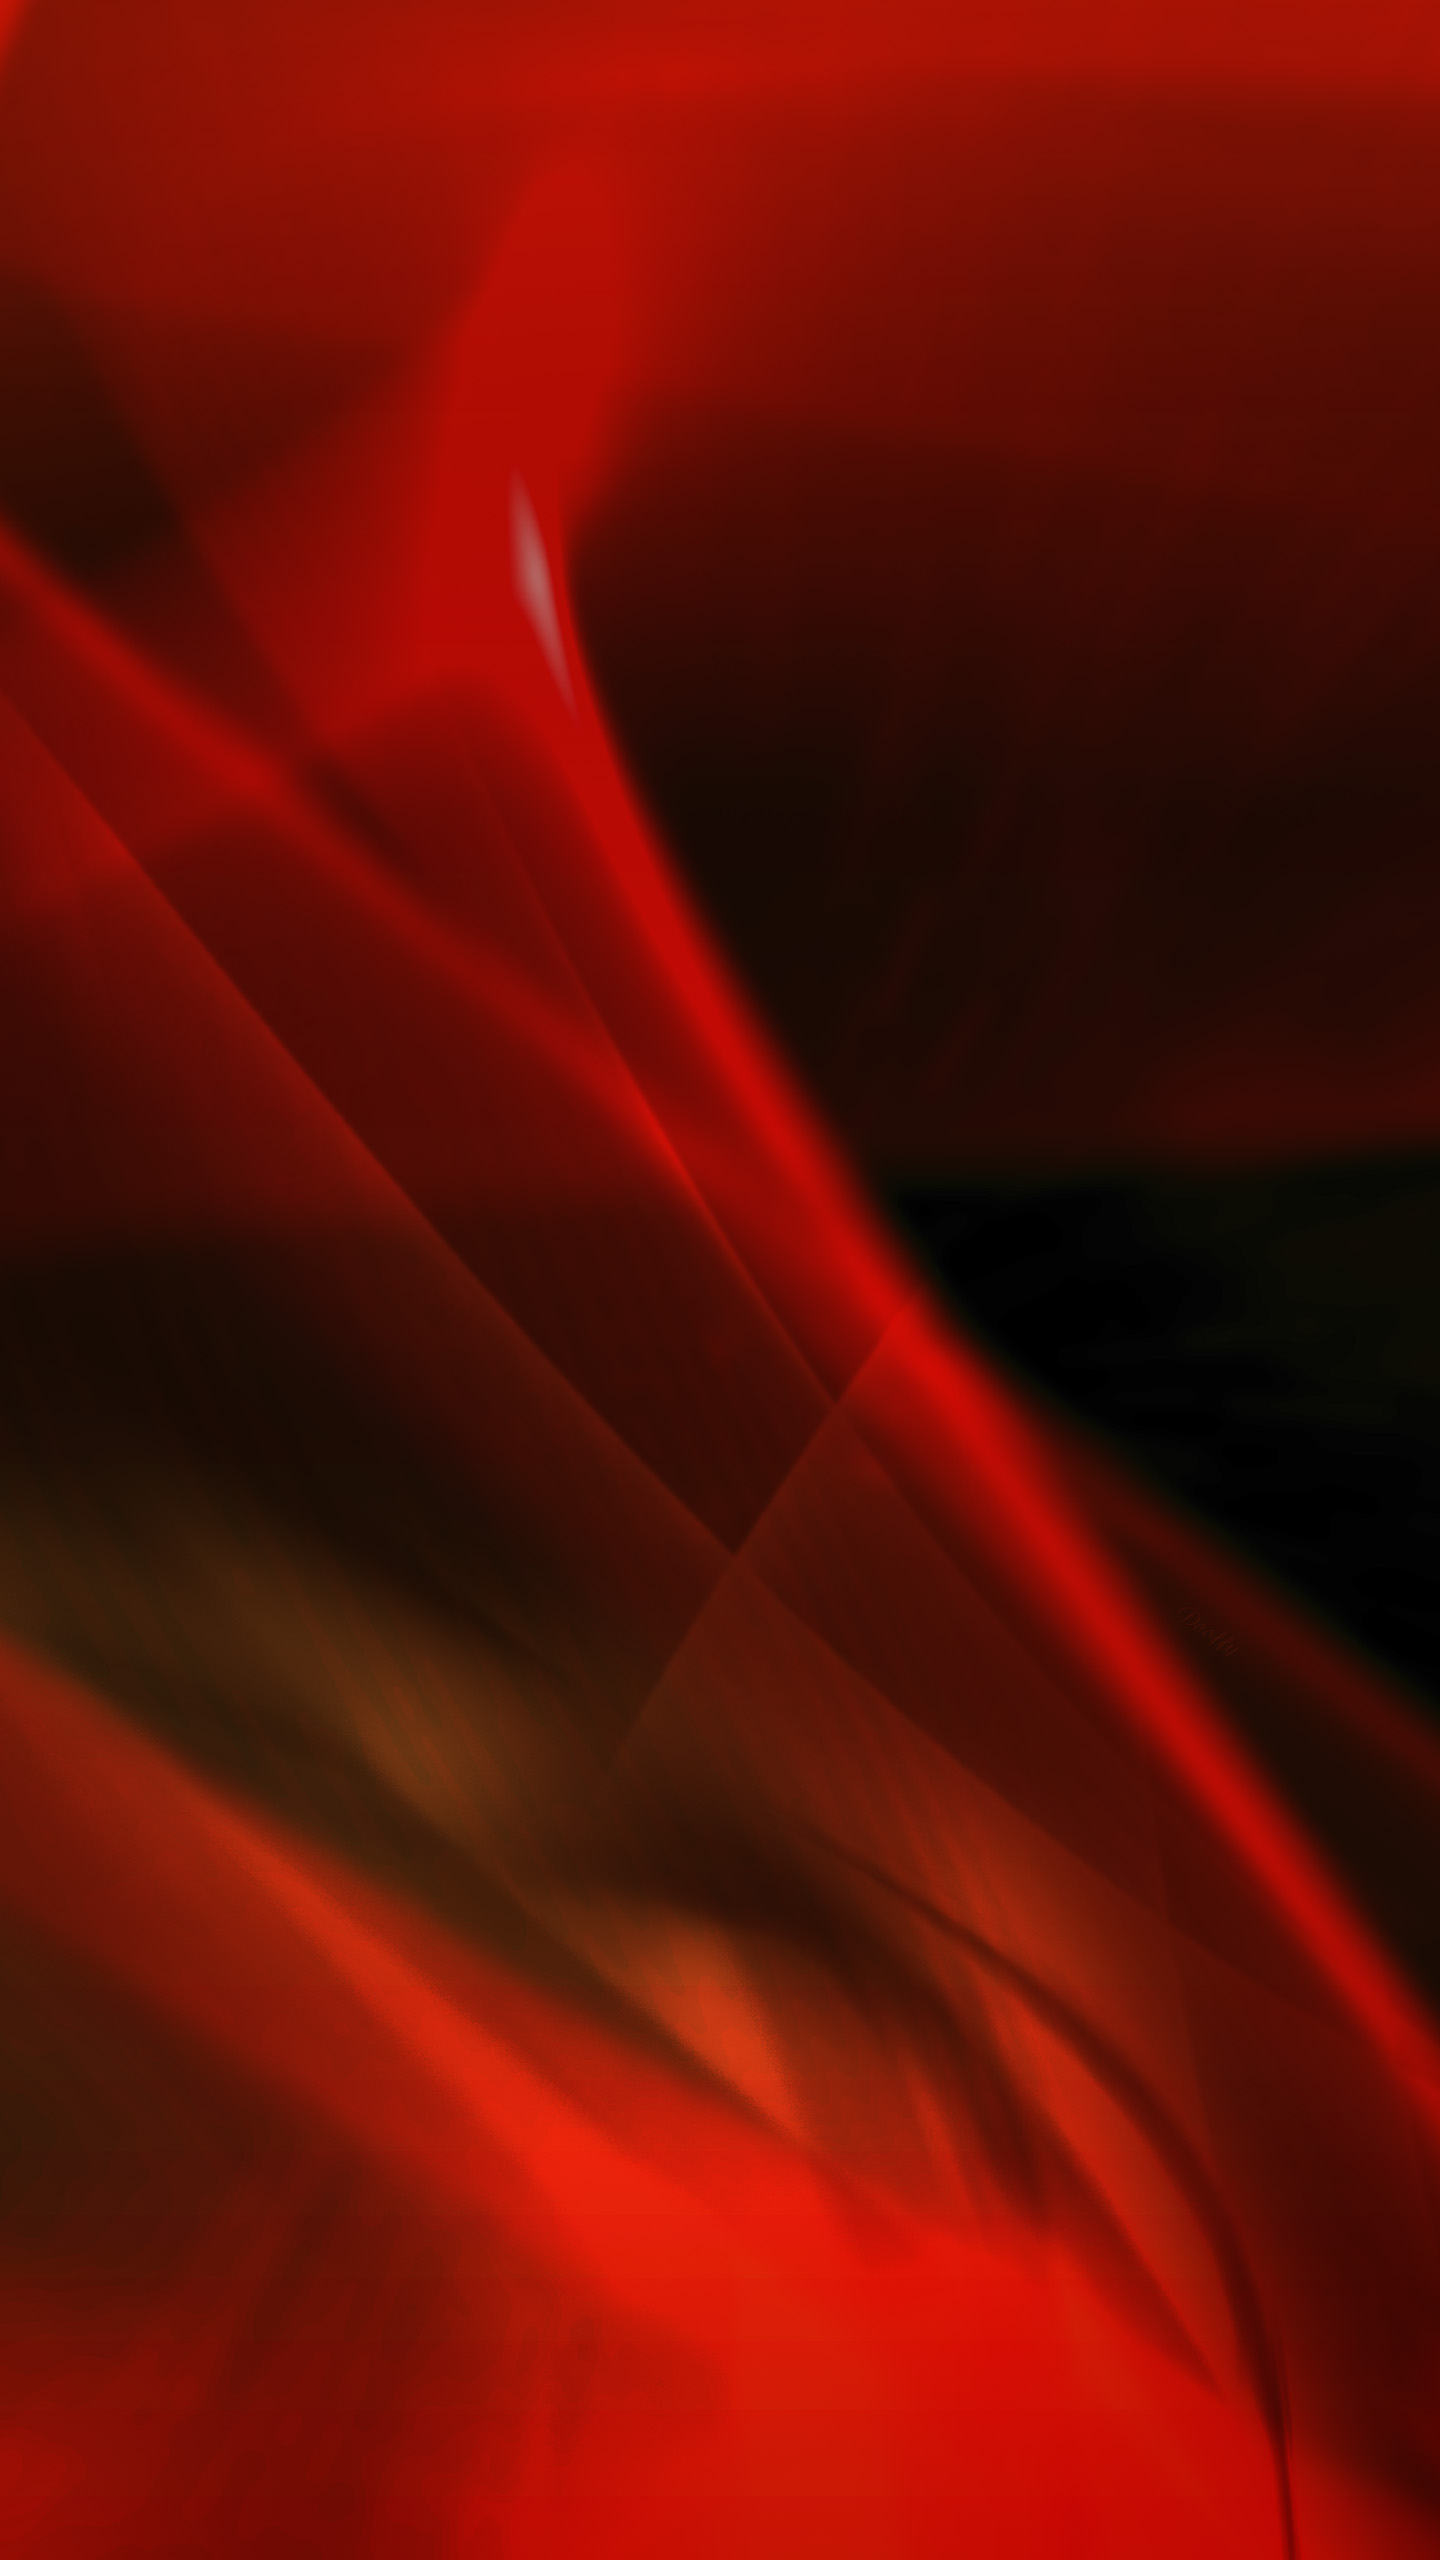 Wallpaper Samsung Galaxy S6 Red Wave By Dooffy By Dooffy Design On Deviantart